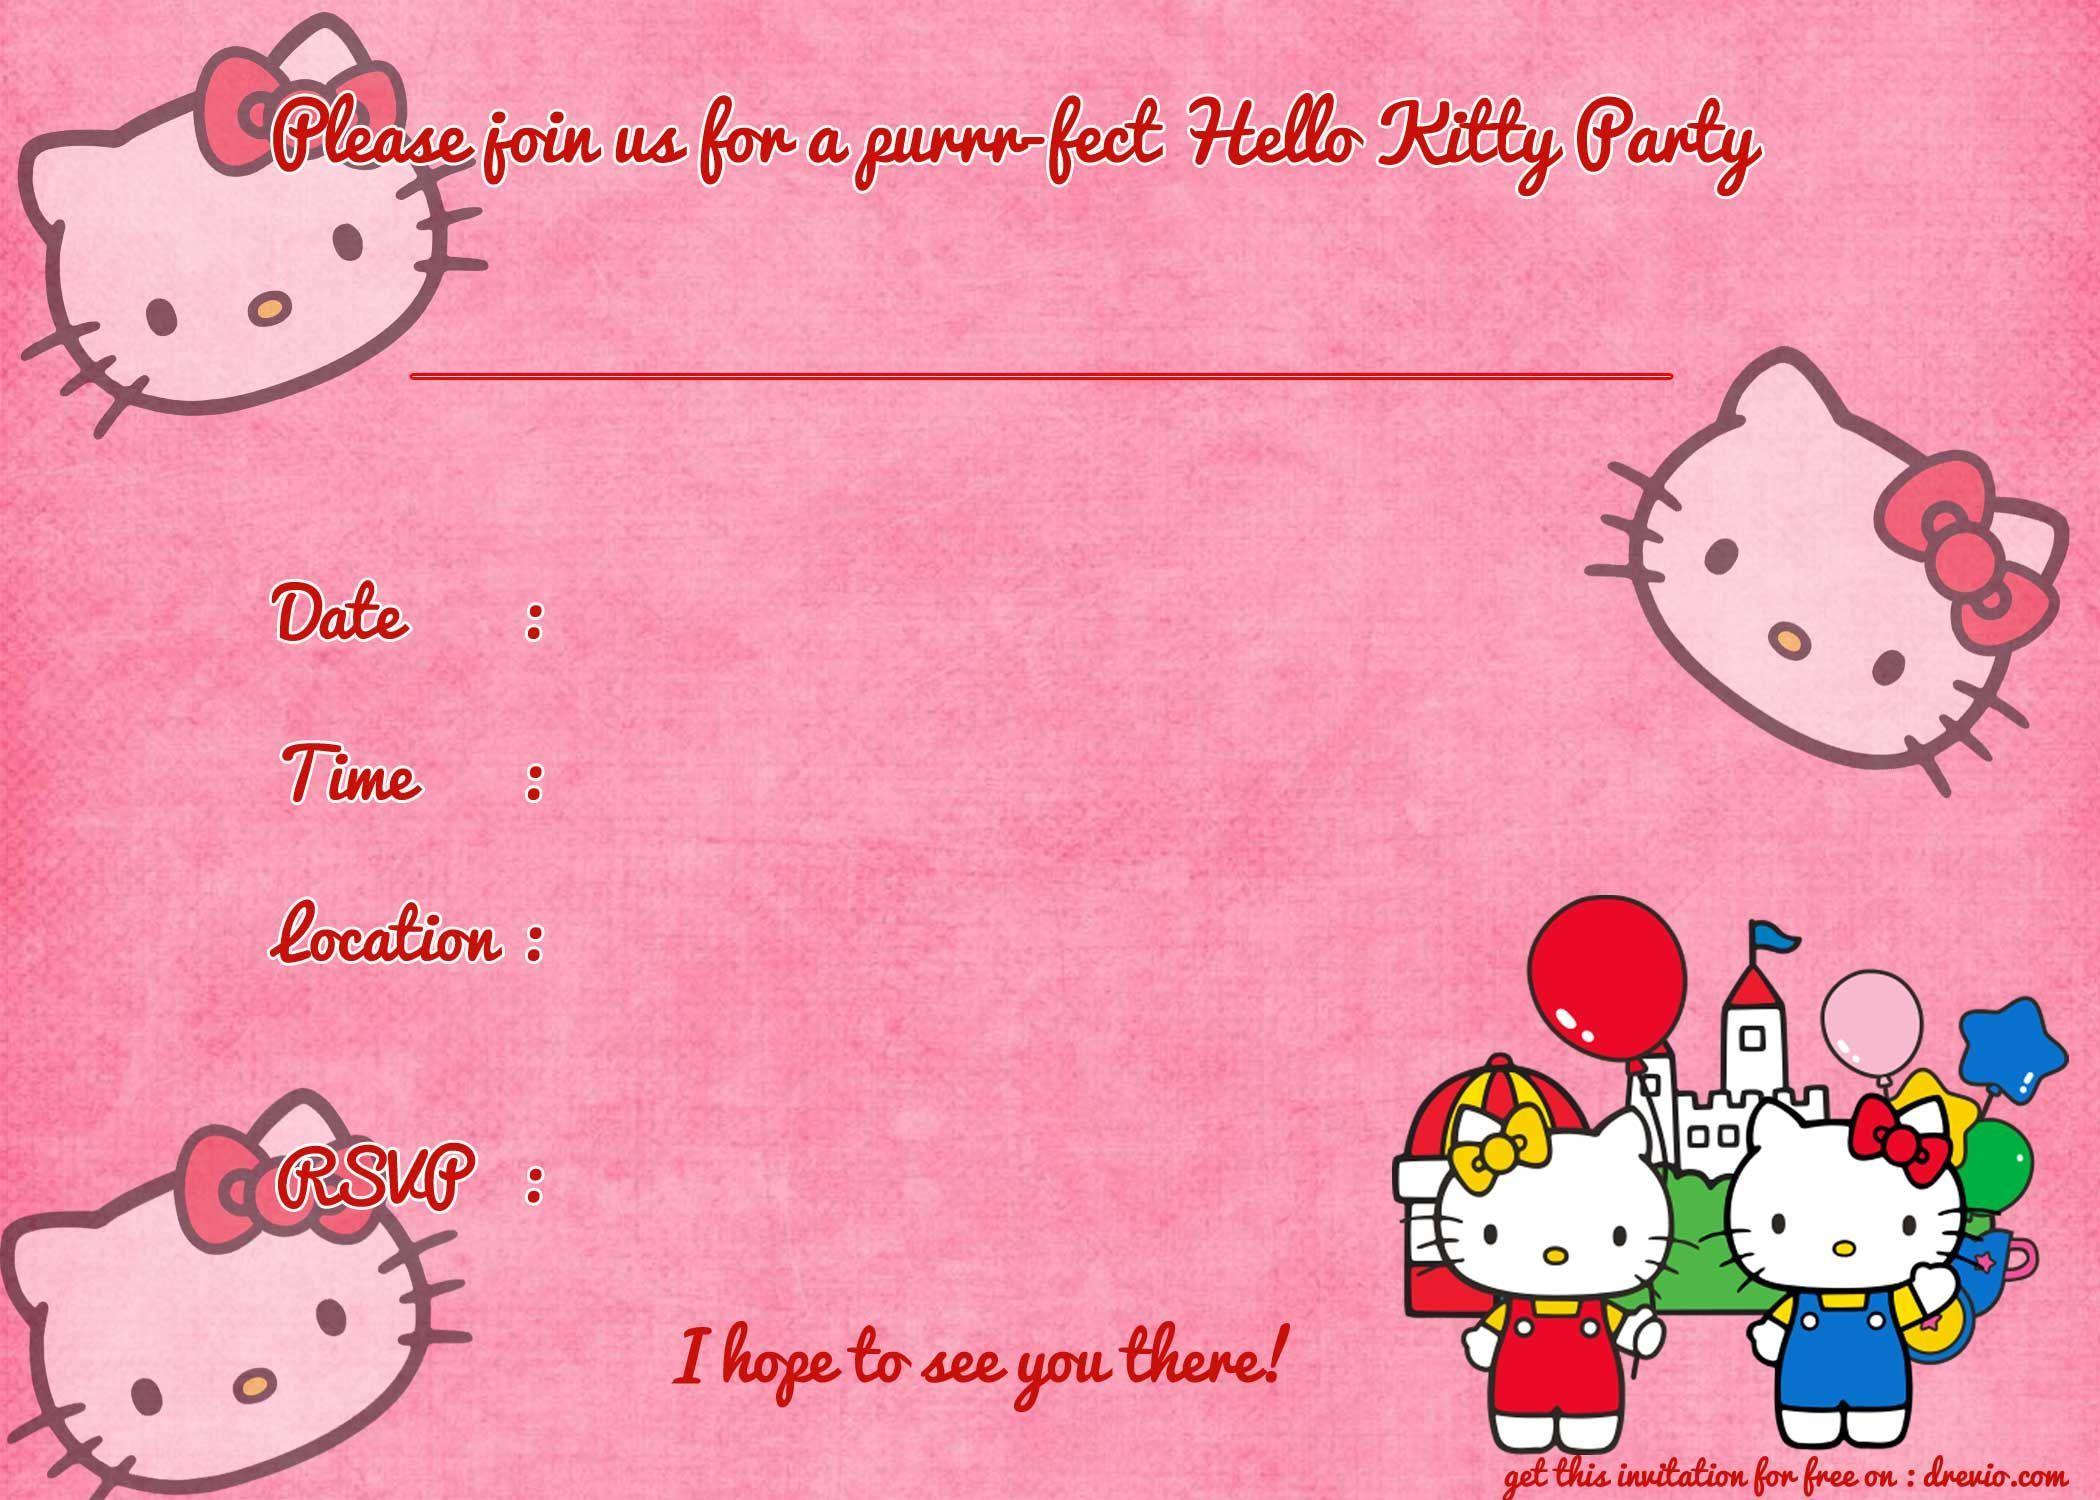 Printable Hello Kitty Birthday Invitation Template Party For Hello Kitty Hello Kitty Birthday Invitations Hello Kitty Invitations Hello Kitty Invitation Card